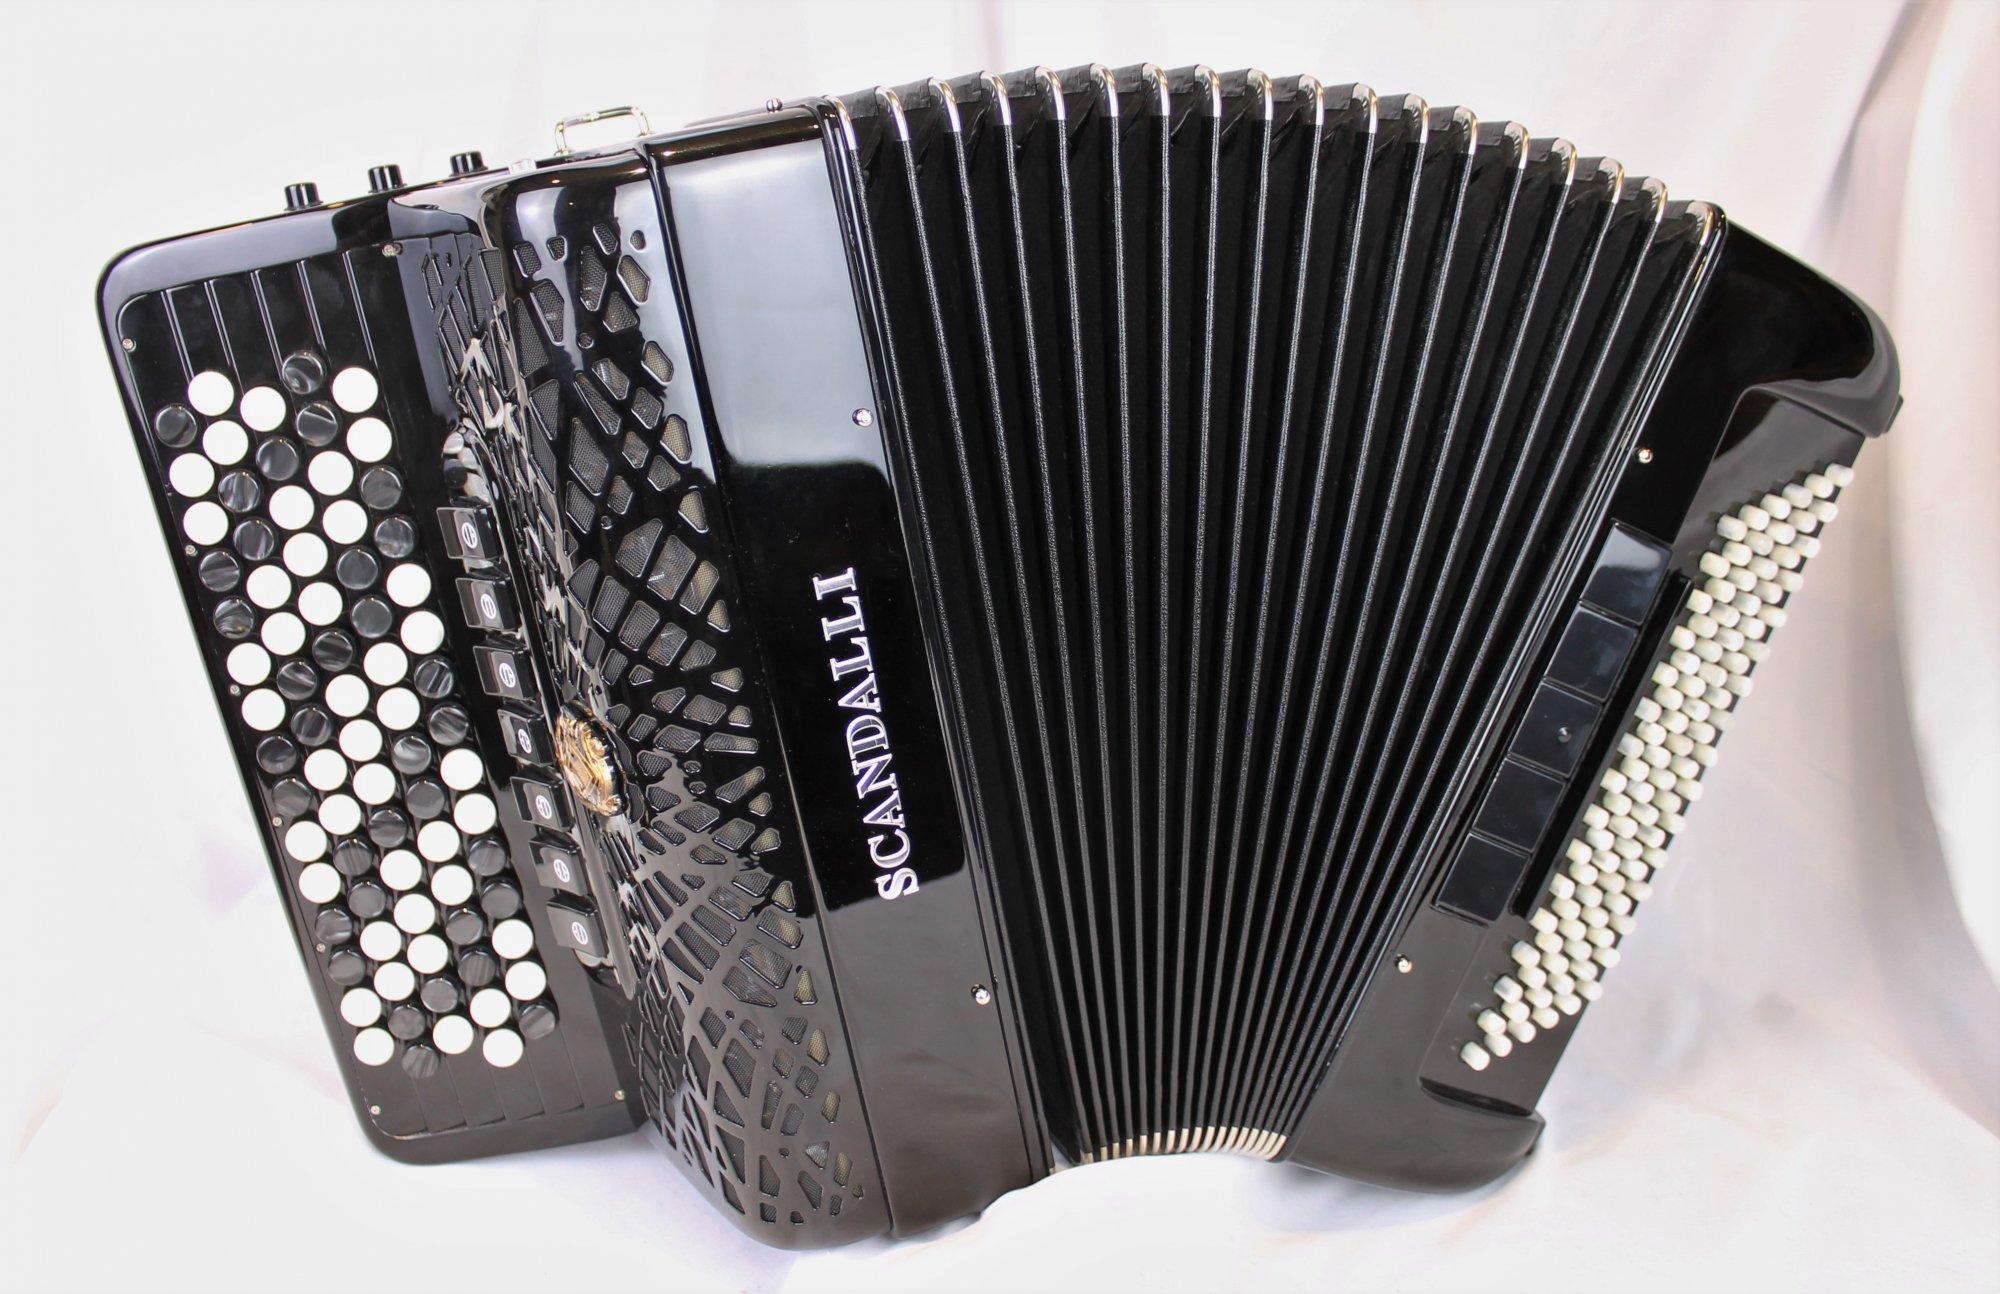 NEW Black Scandalli Conservatorio C 342 Chromatic Button Accordion Converter LMH 77 96